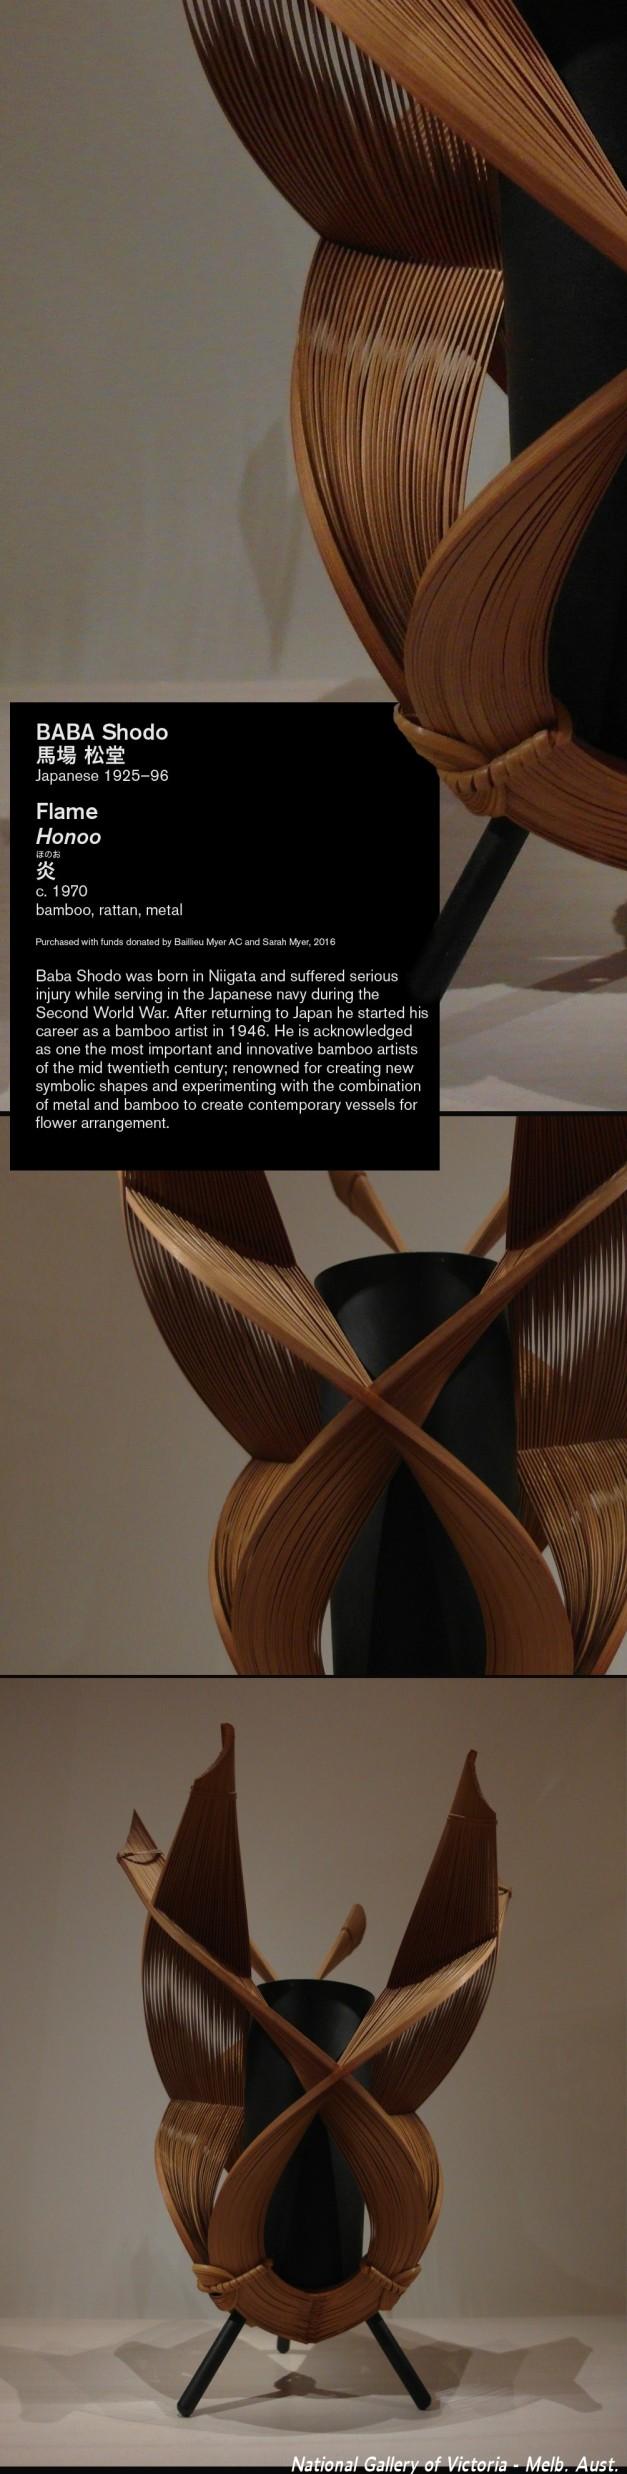 i-bamboo#3-4